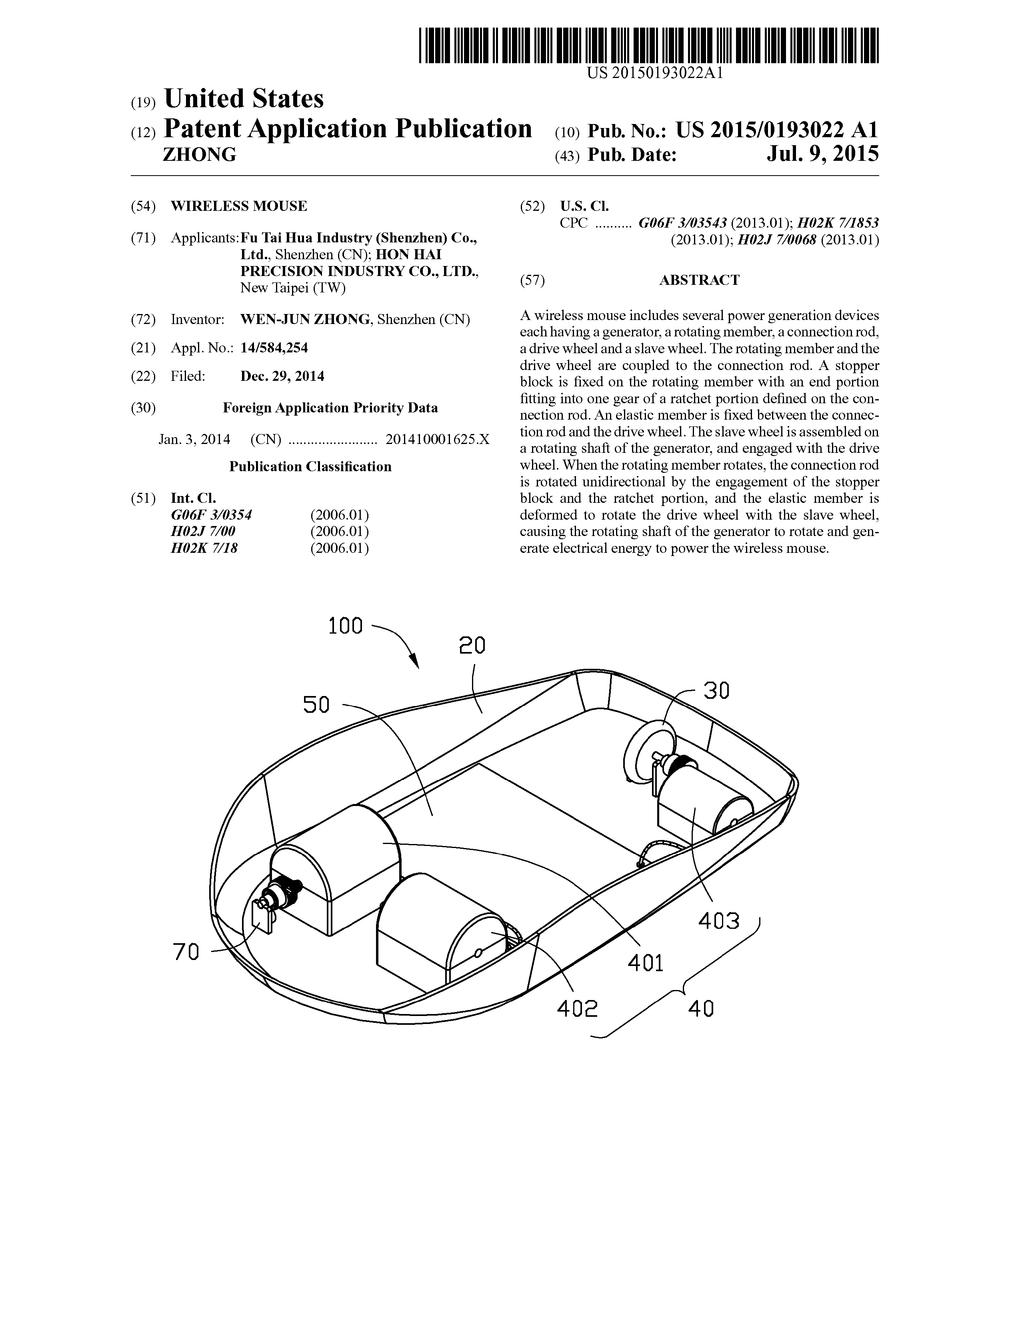 [DIAGRAM_38IU]  WIRELESS MOUSE - diagram, schematic, and image 01 | Wireless Mouse Diagram |  | Patents